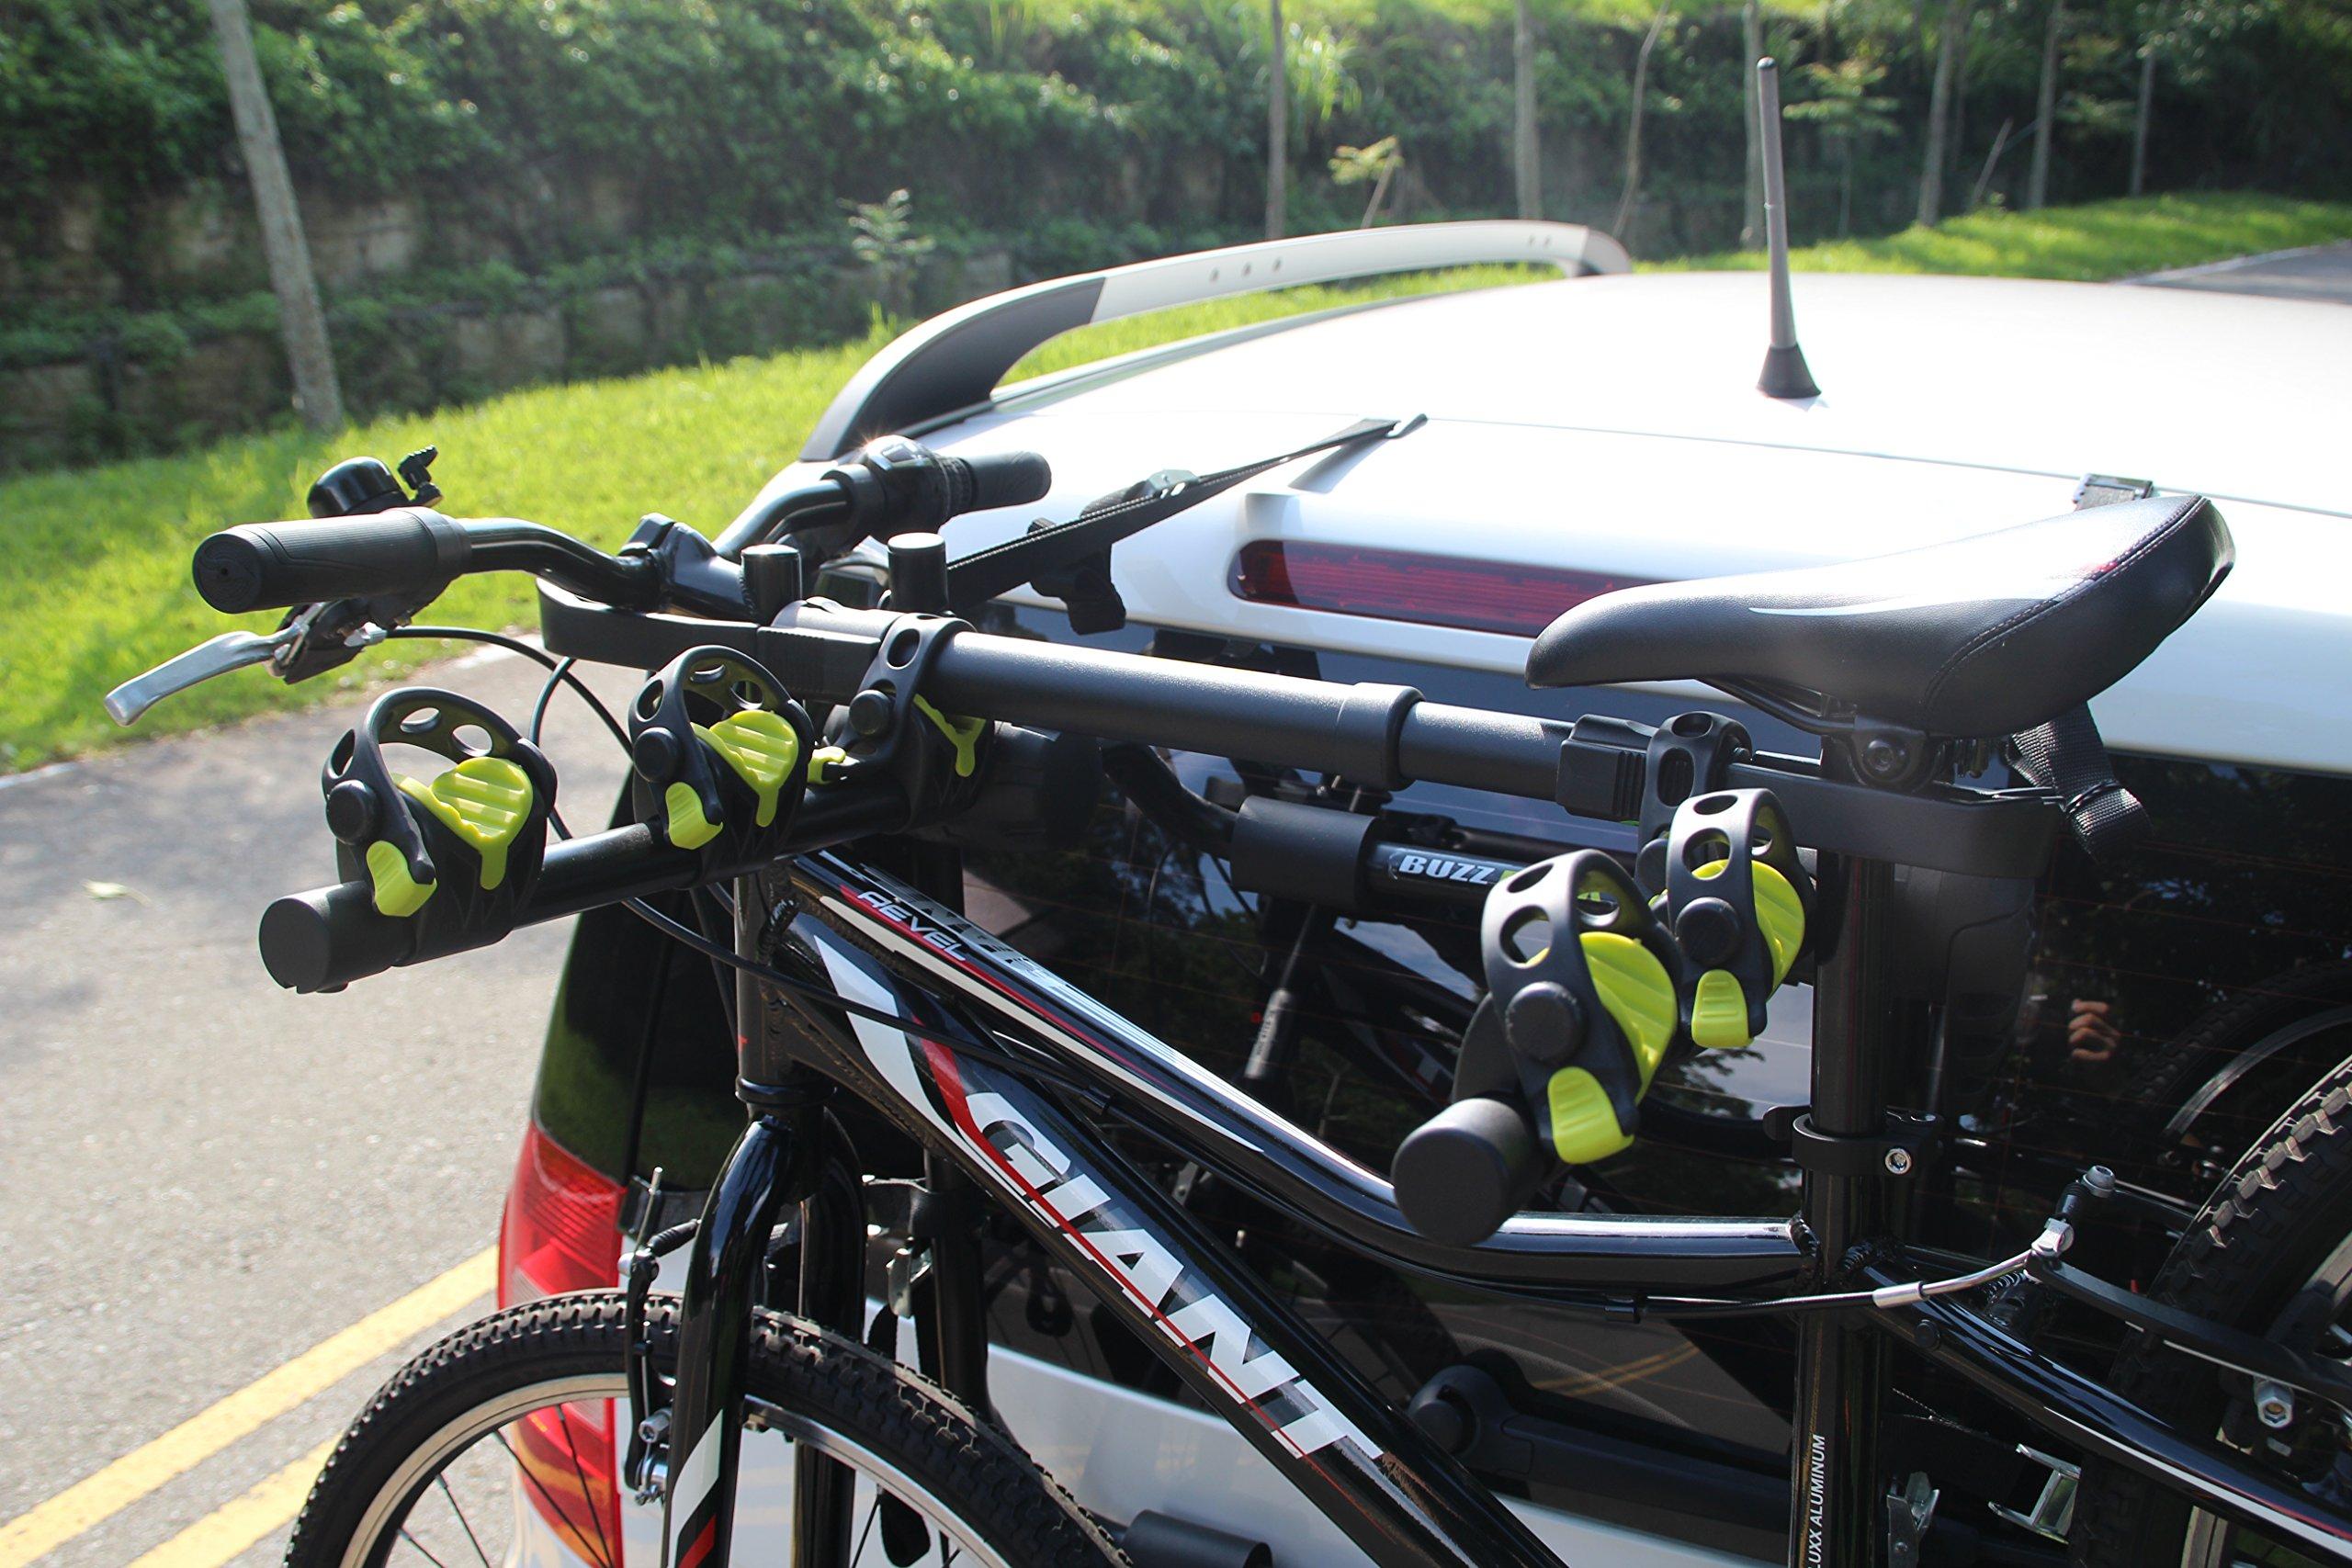 BUZZ RACK GRIP Deluxe Black Bike Top Frame Cross Bar Telescopic Adaptor by BUZZ RACK (Image #5)